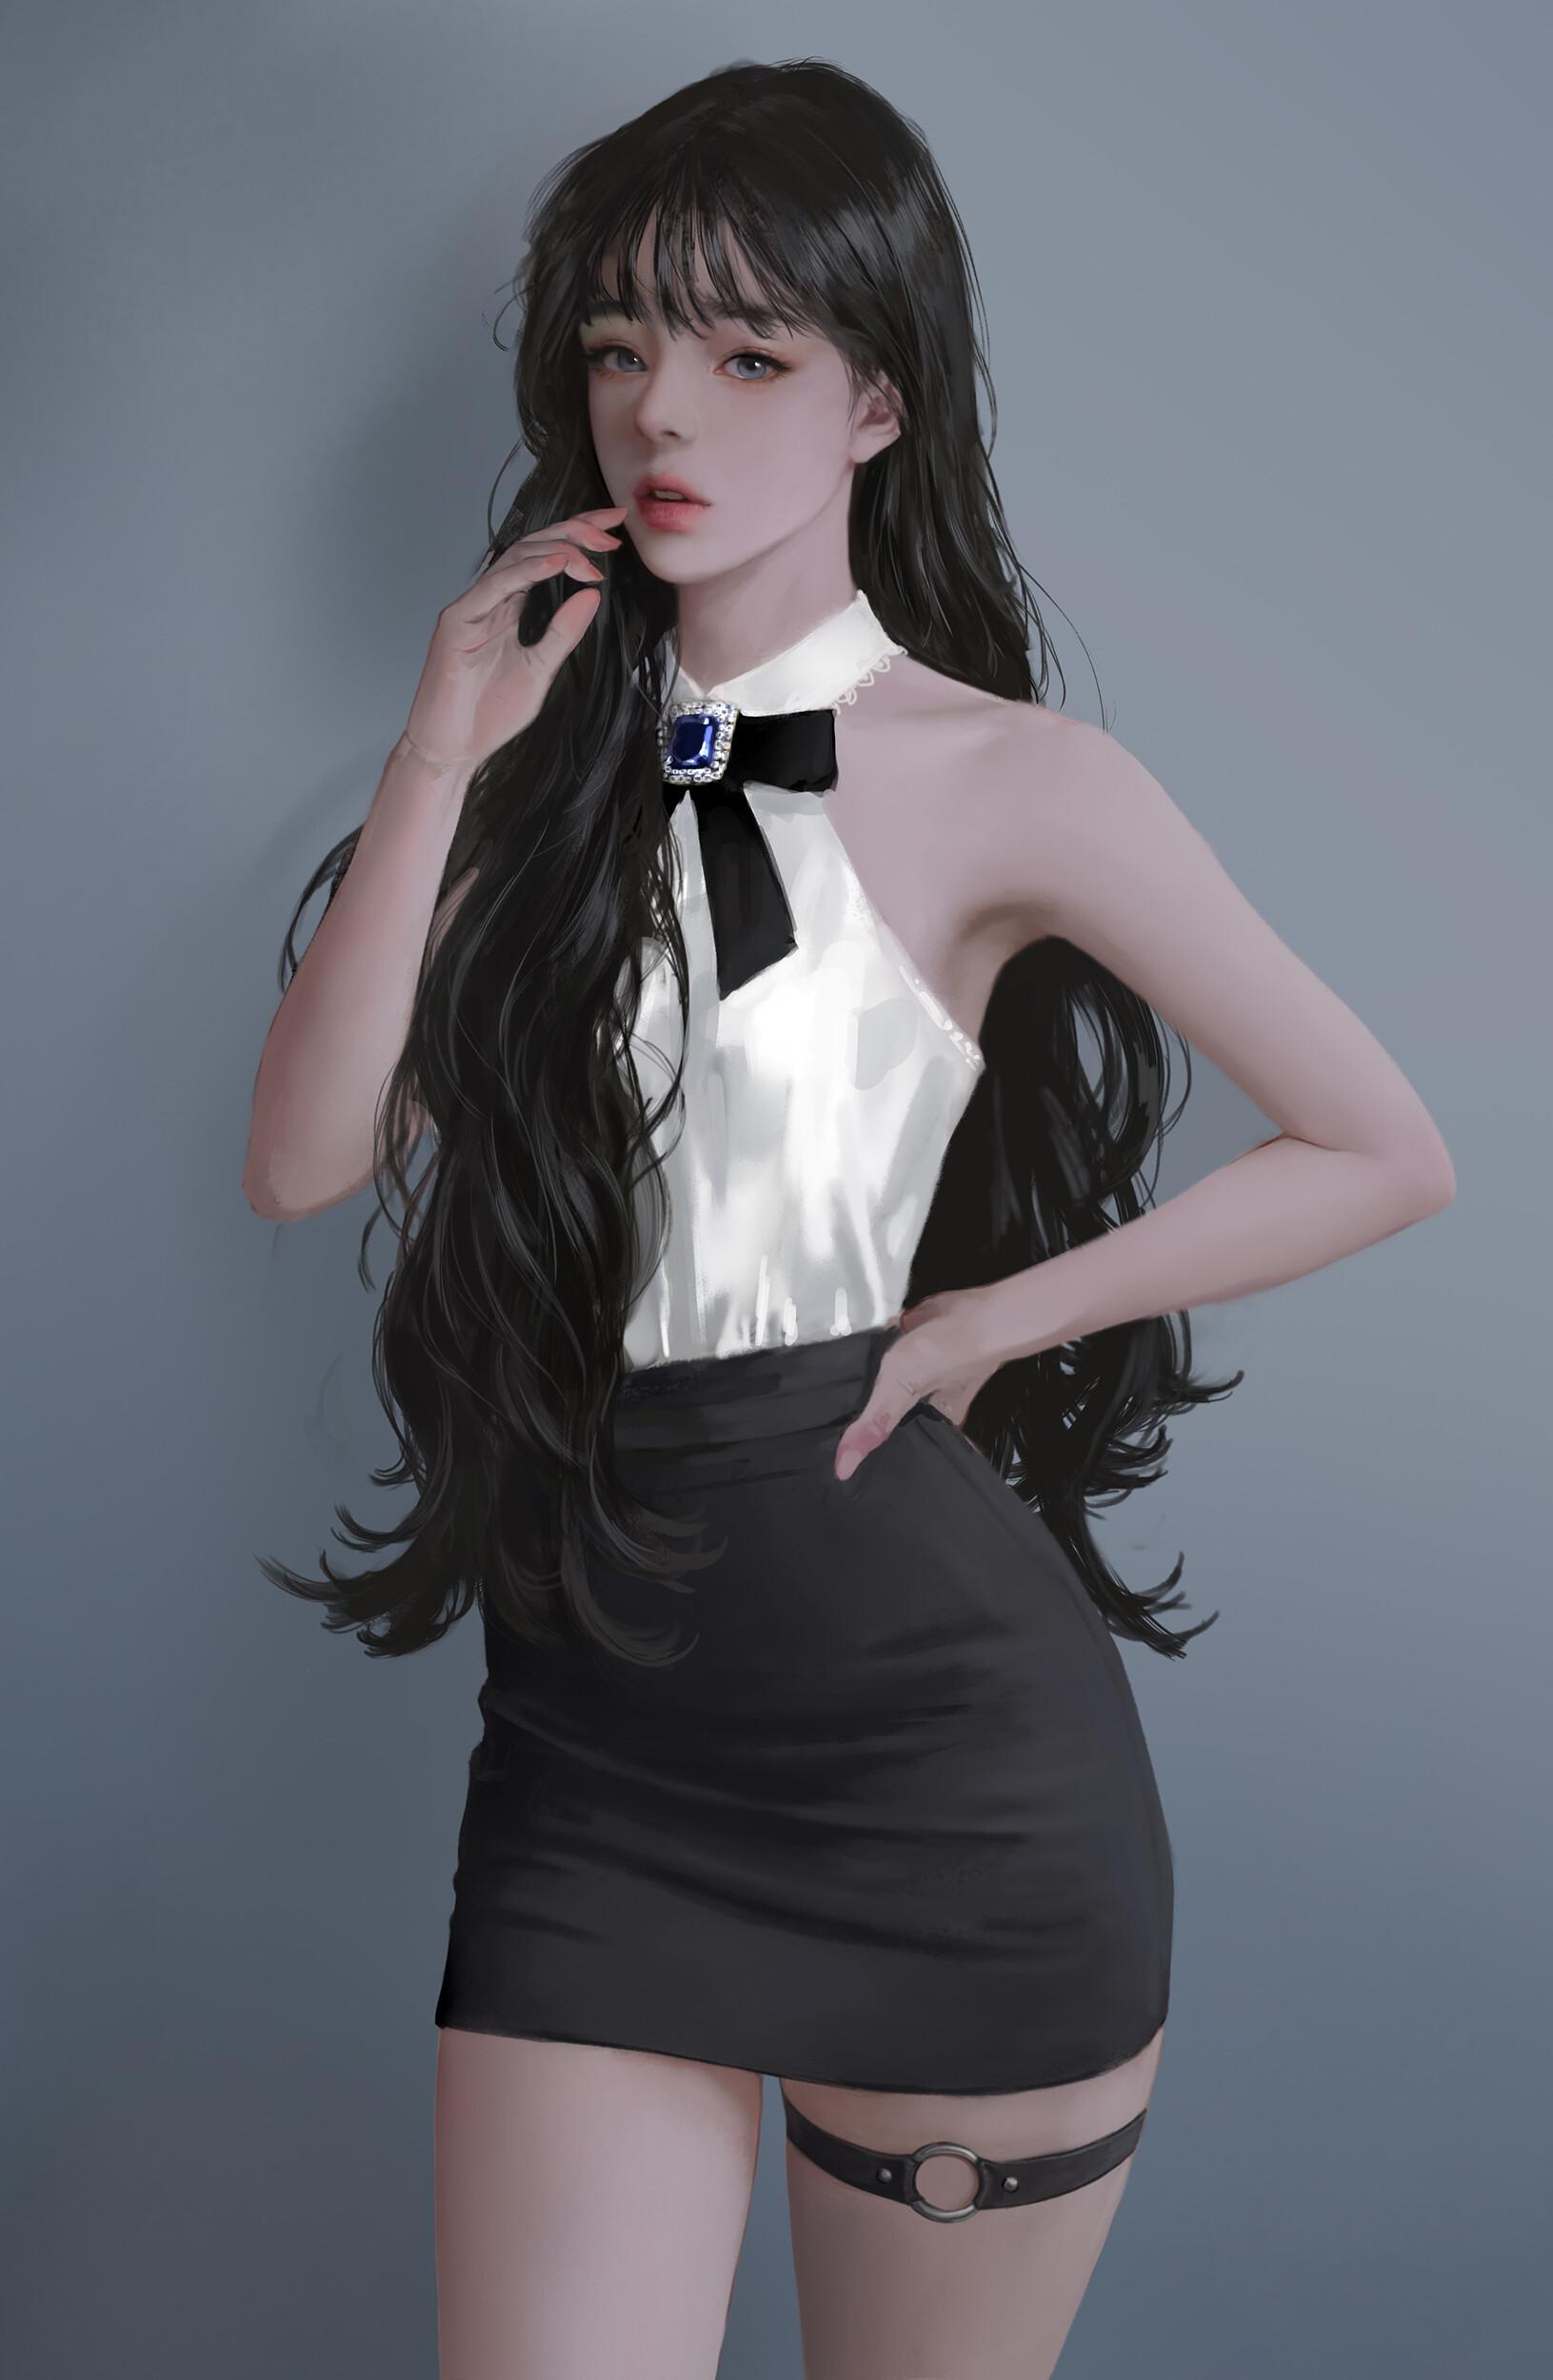 PIXIV 韩国艺术家J.Won Han